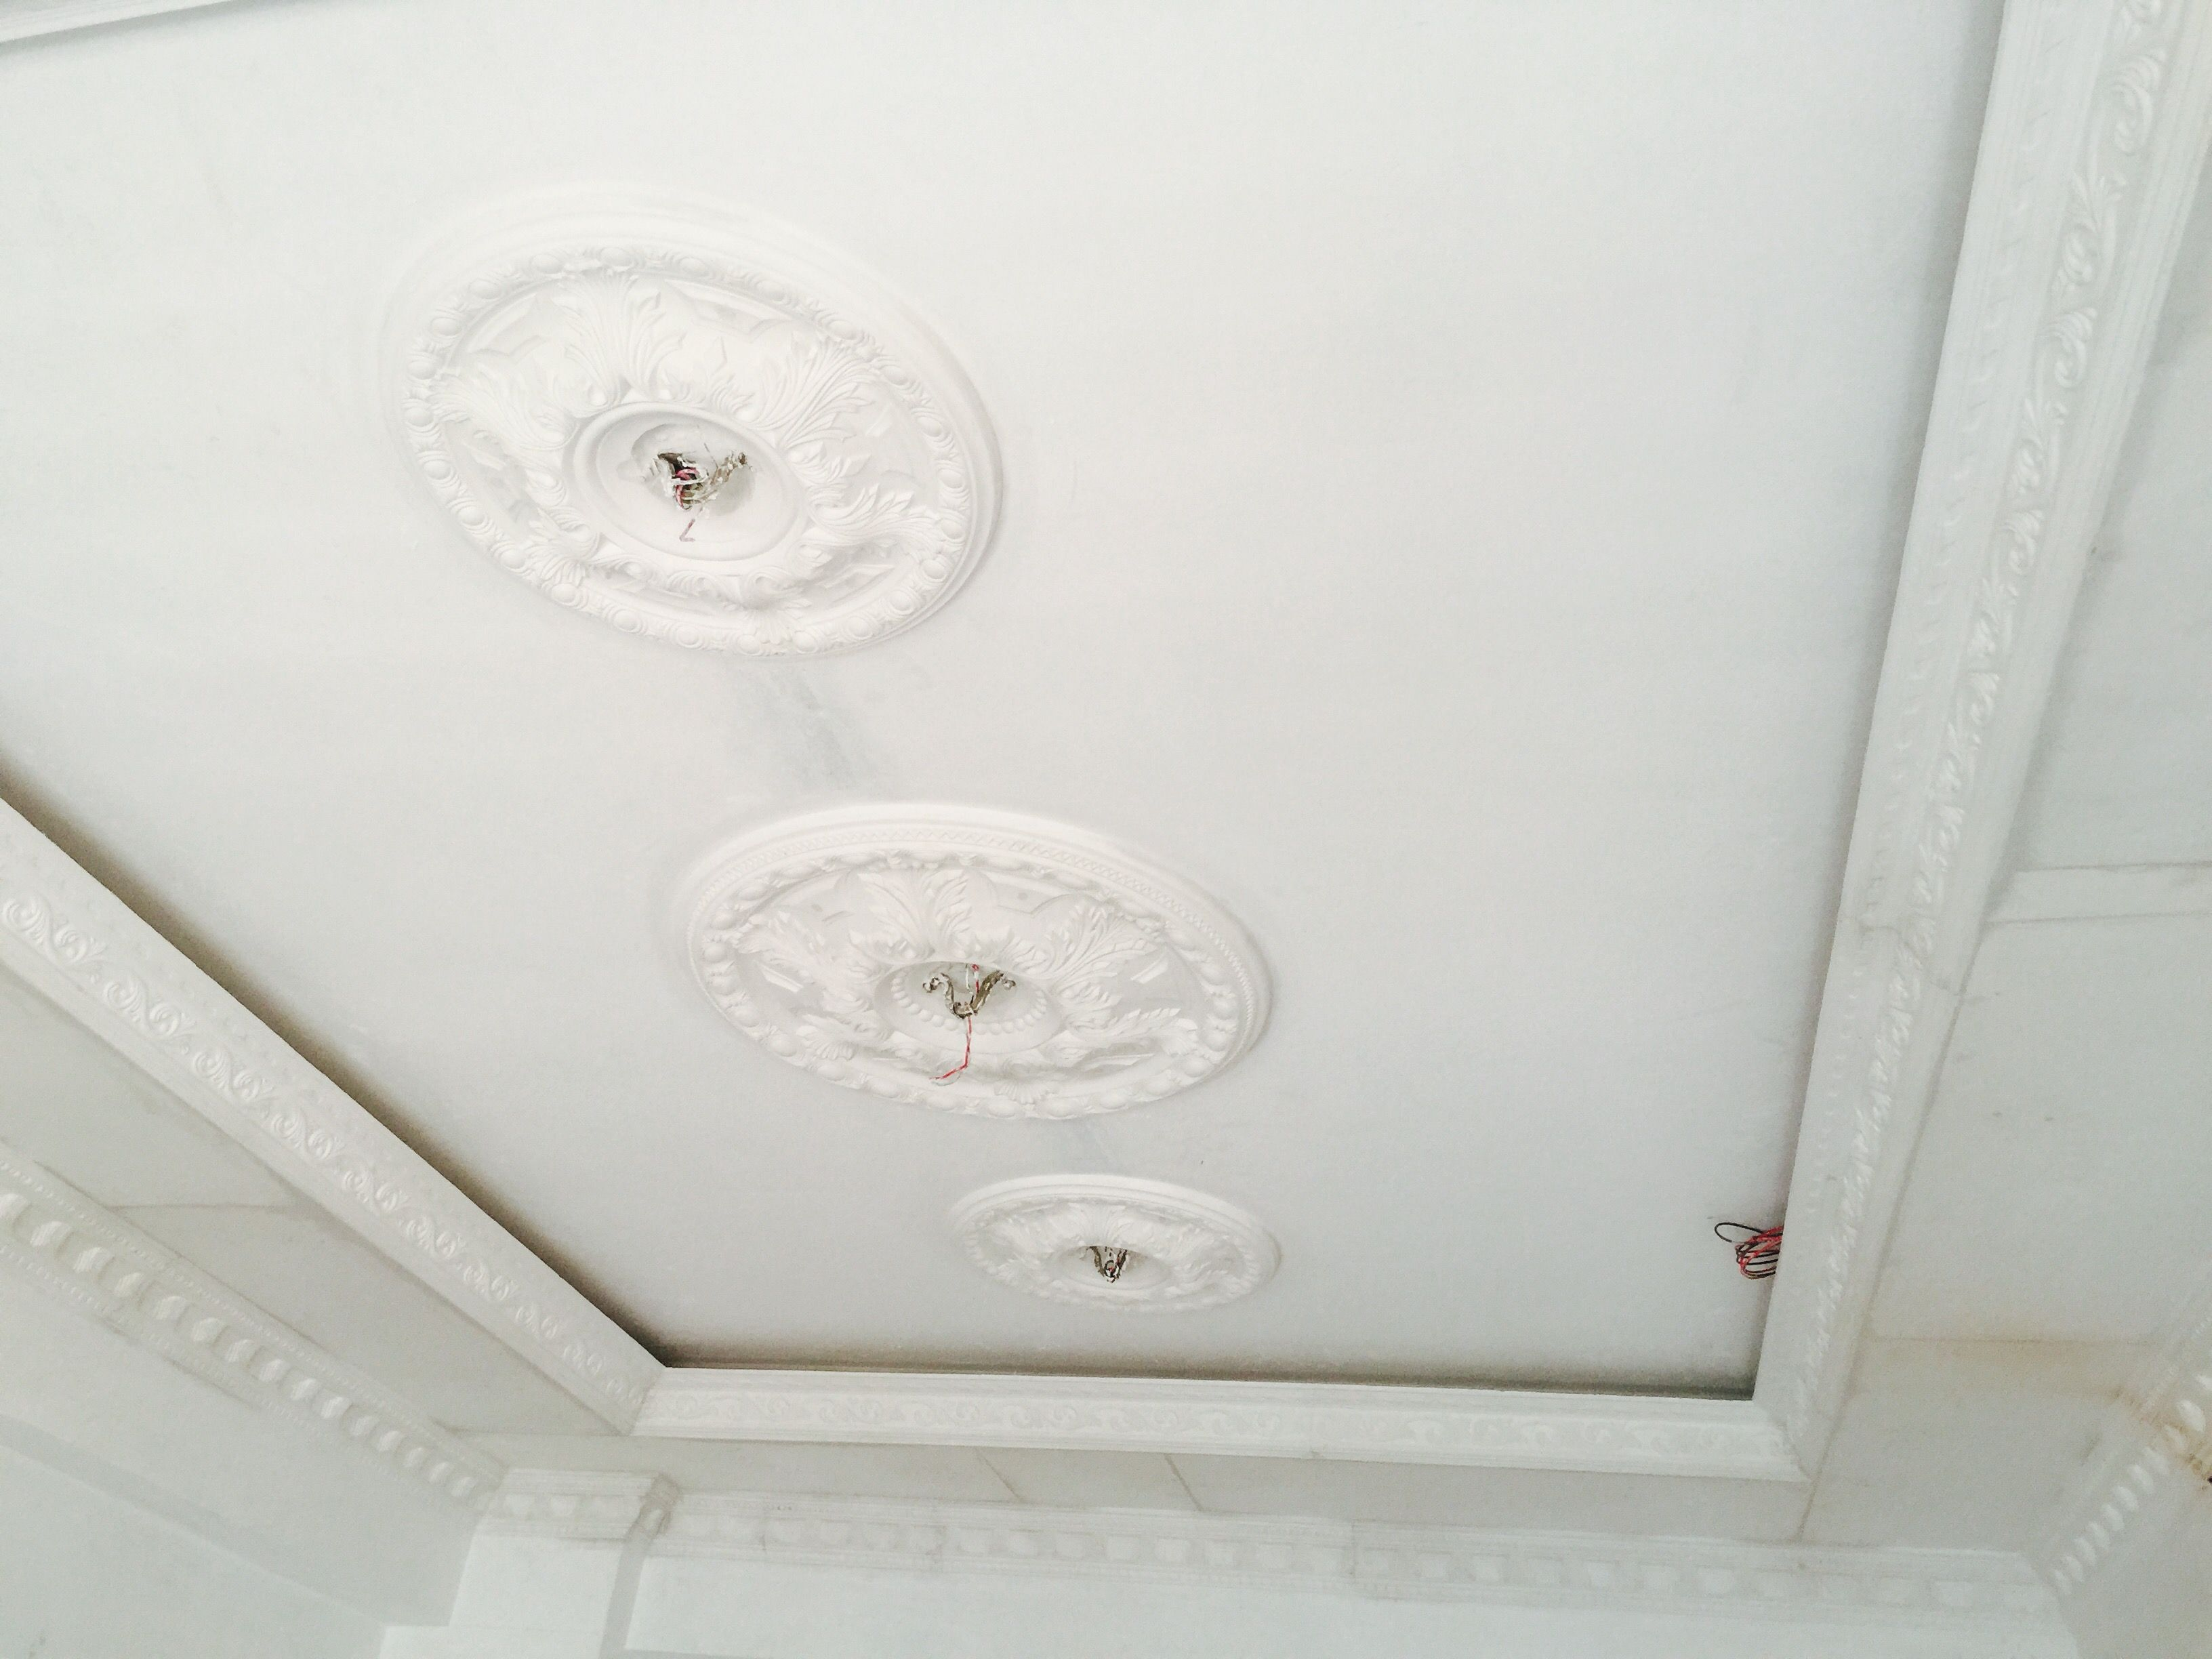 Manufacturer of gypsum false ceiling gypsum ceiling work gypsum manufacturer of gypsum false ceiling gypsum ceiling work gypsum ceiling tile gypsum ceiling dailygadgetfo Images